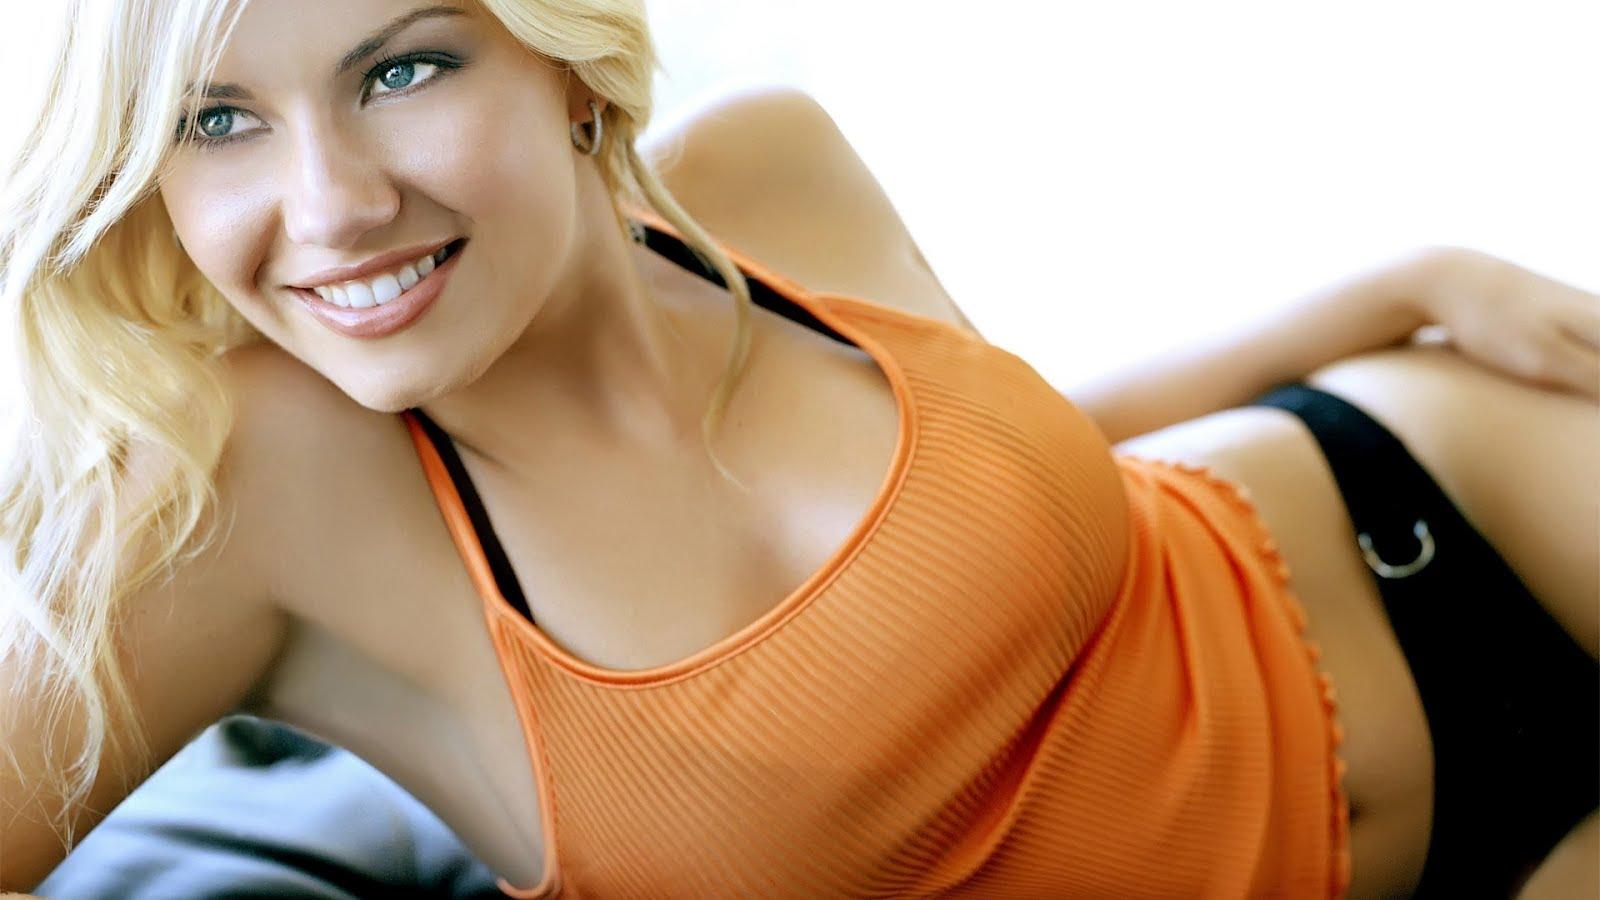 http://2.bp.blogspot.com/--laCNE678PA/TzbN389yF7I/AAAAAAAADDU/GpqvYHB_vBk/s1600/elisha-cuthbert-beautiful-1920x1080.jpg